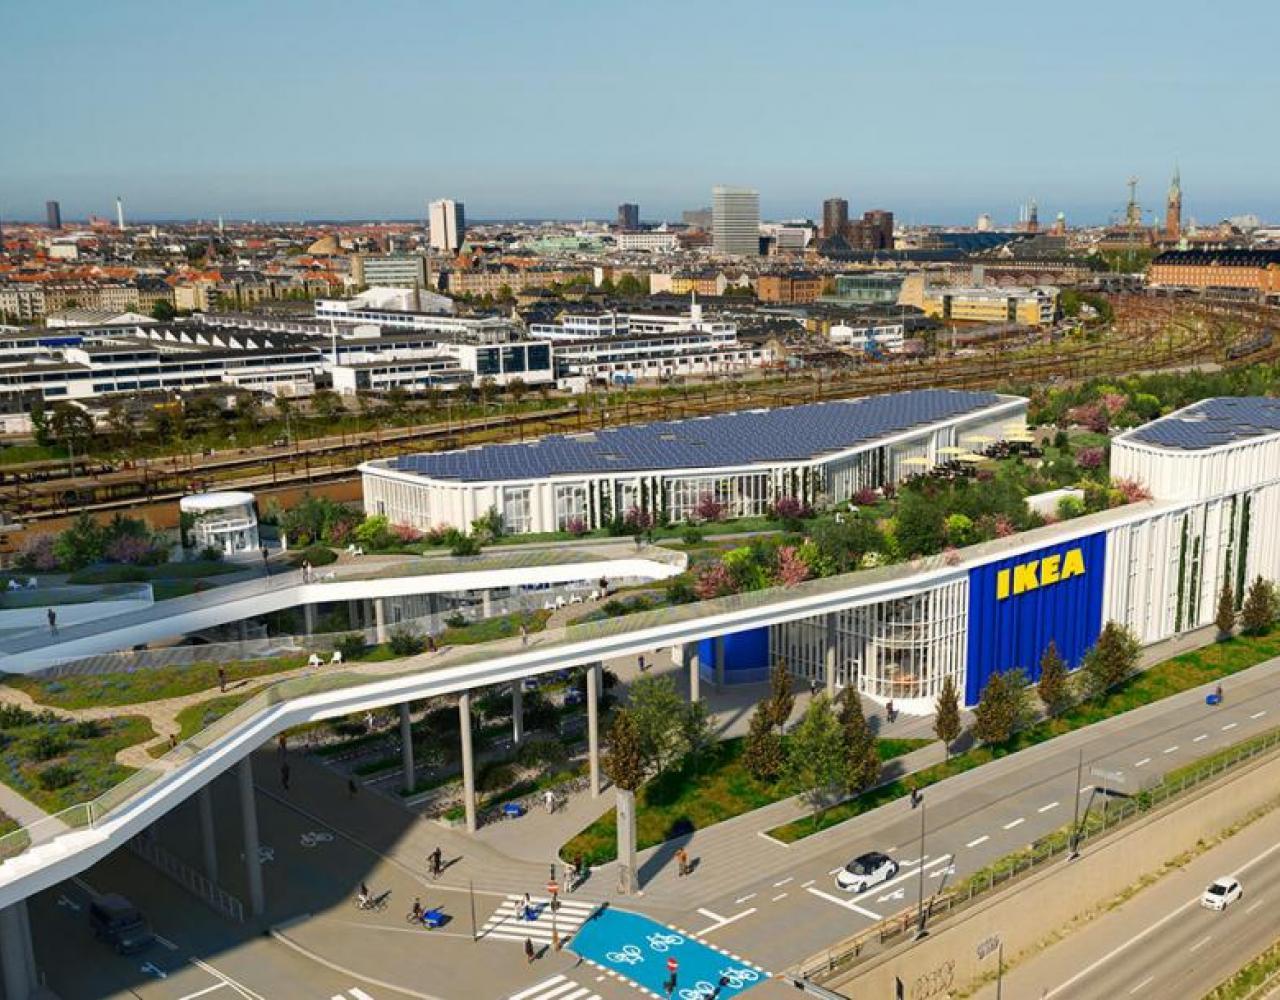 IKEA City åbner i 2023